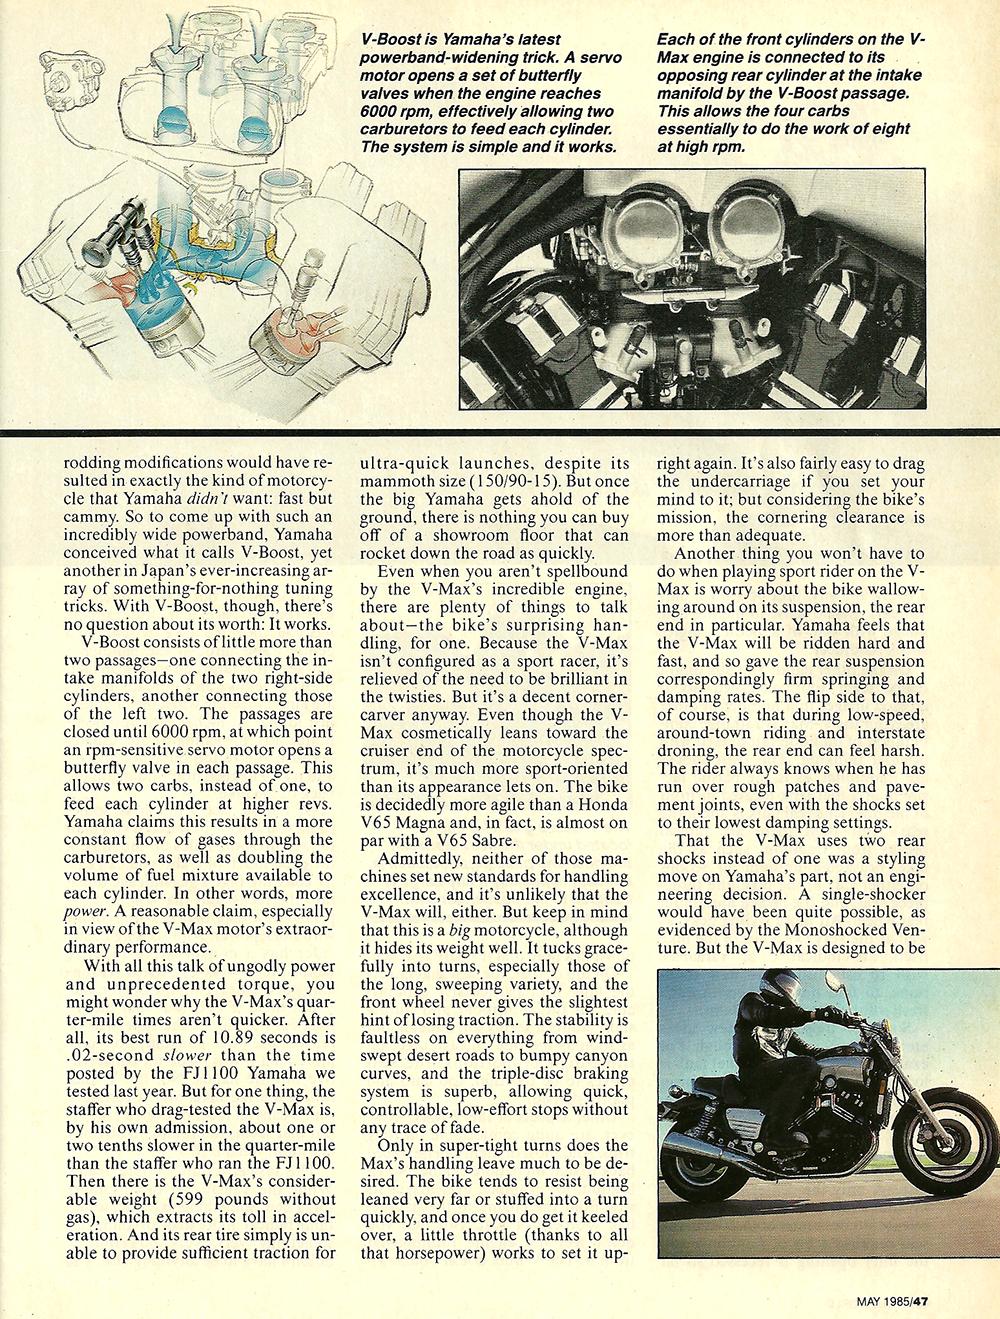 1985 Yamama Vmax 1200 road test 04.jpg